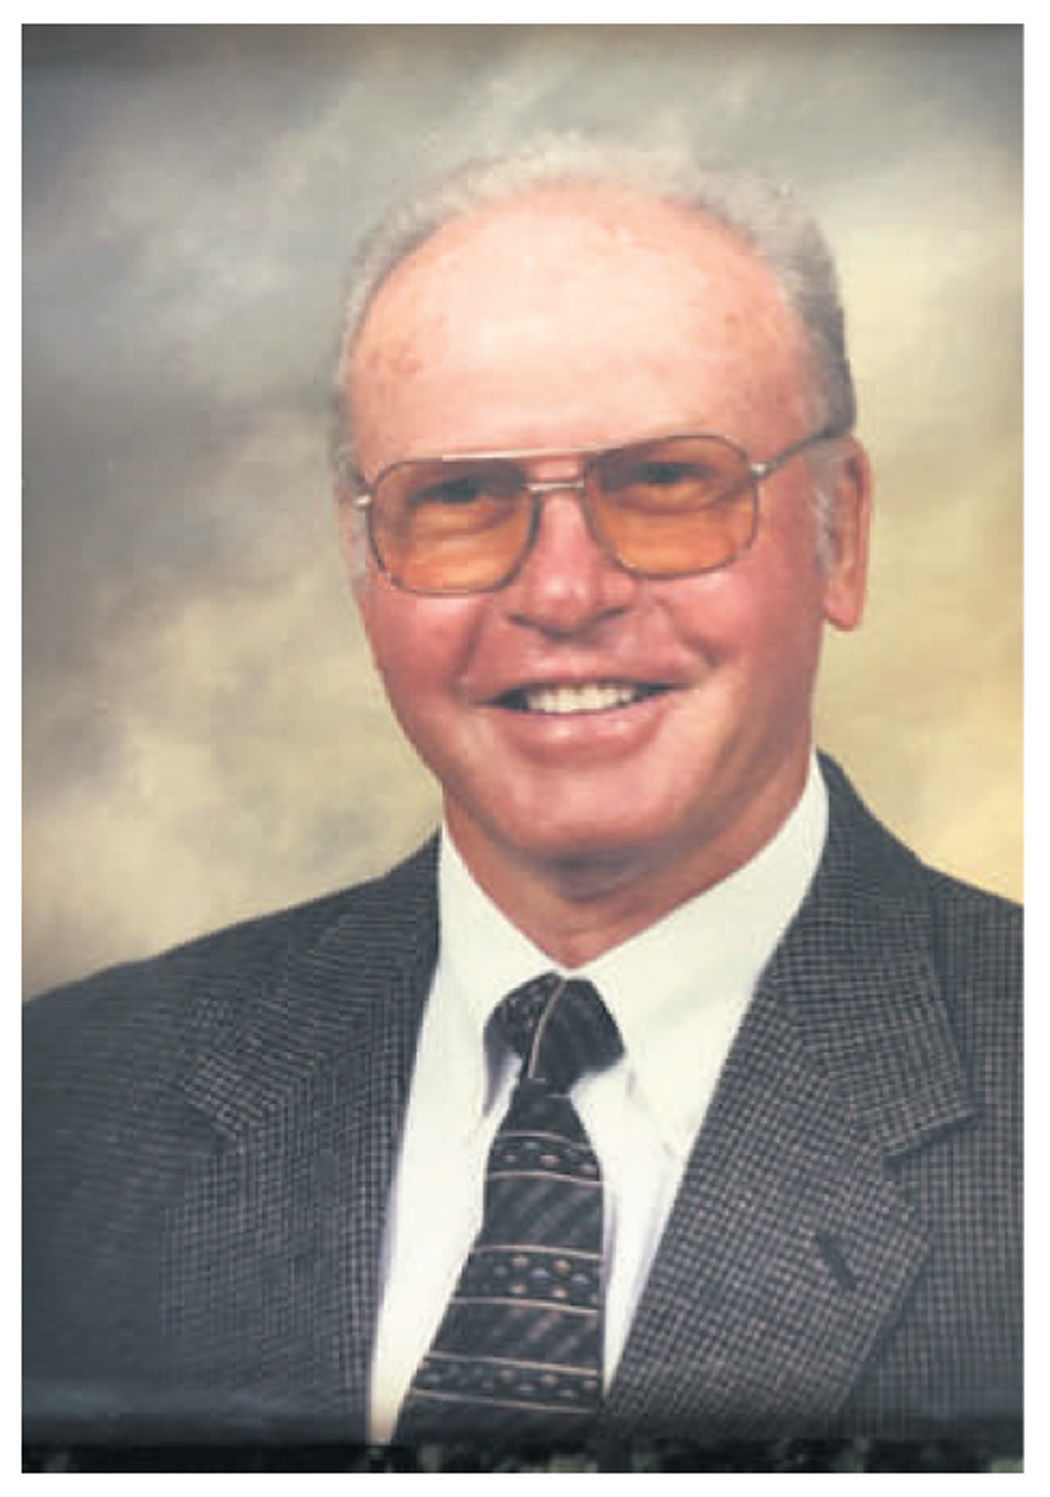 Danny Crane